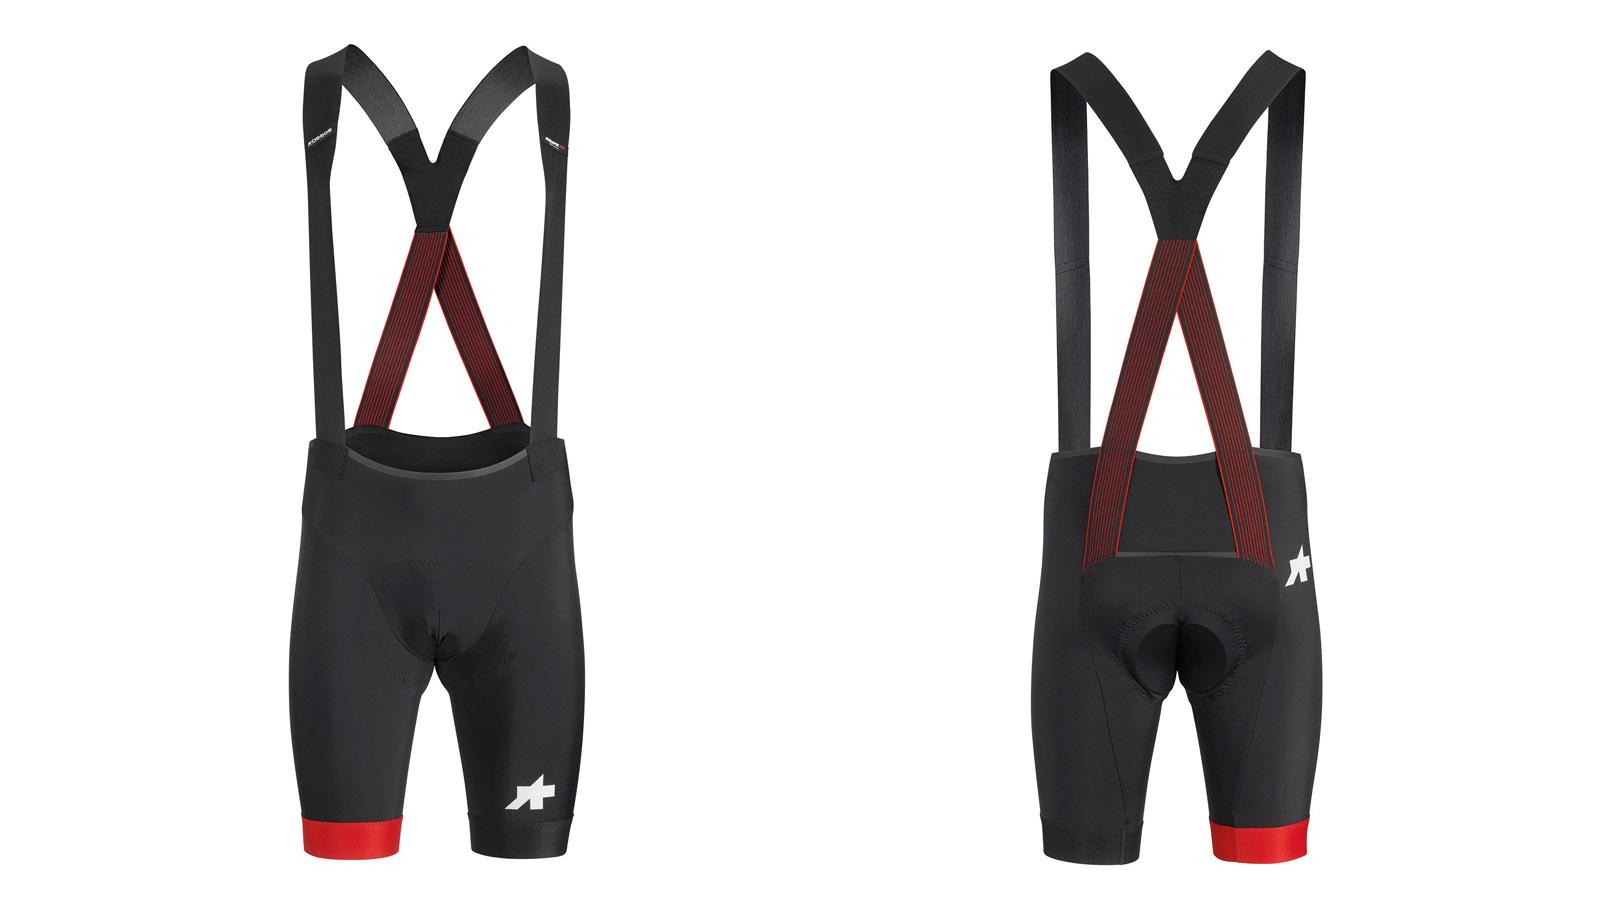 Assos Equipe RS S9 bib shorts